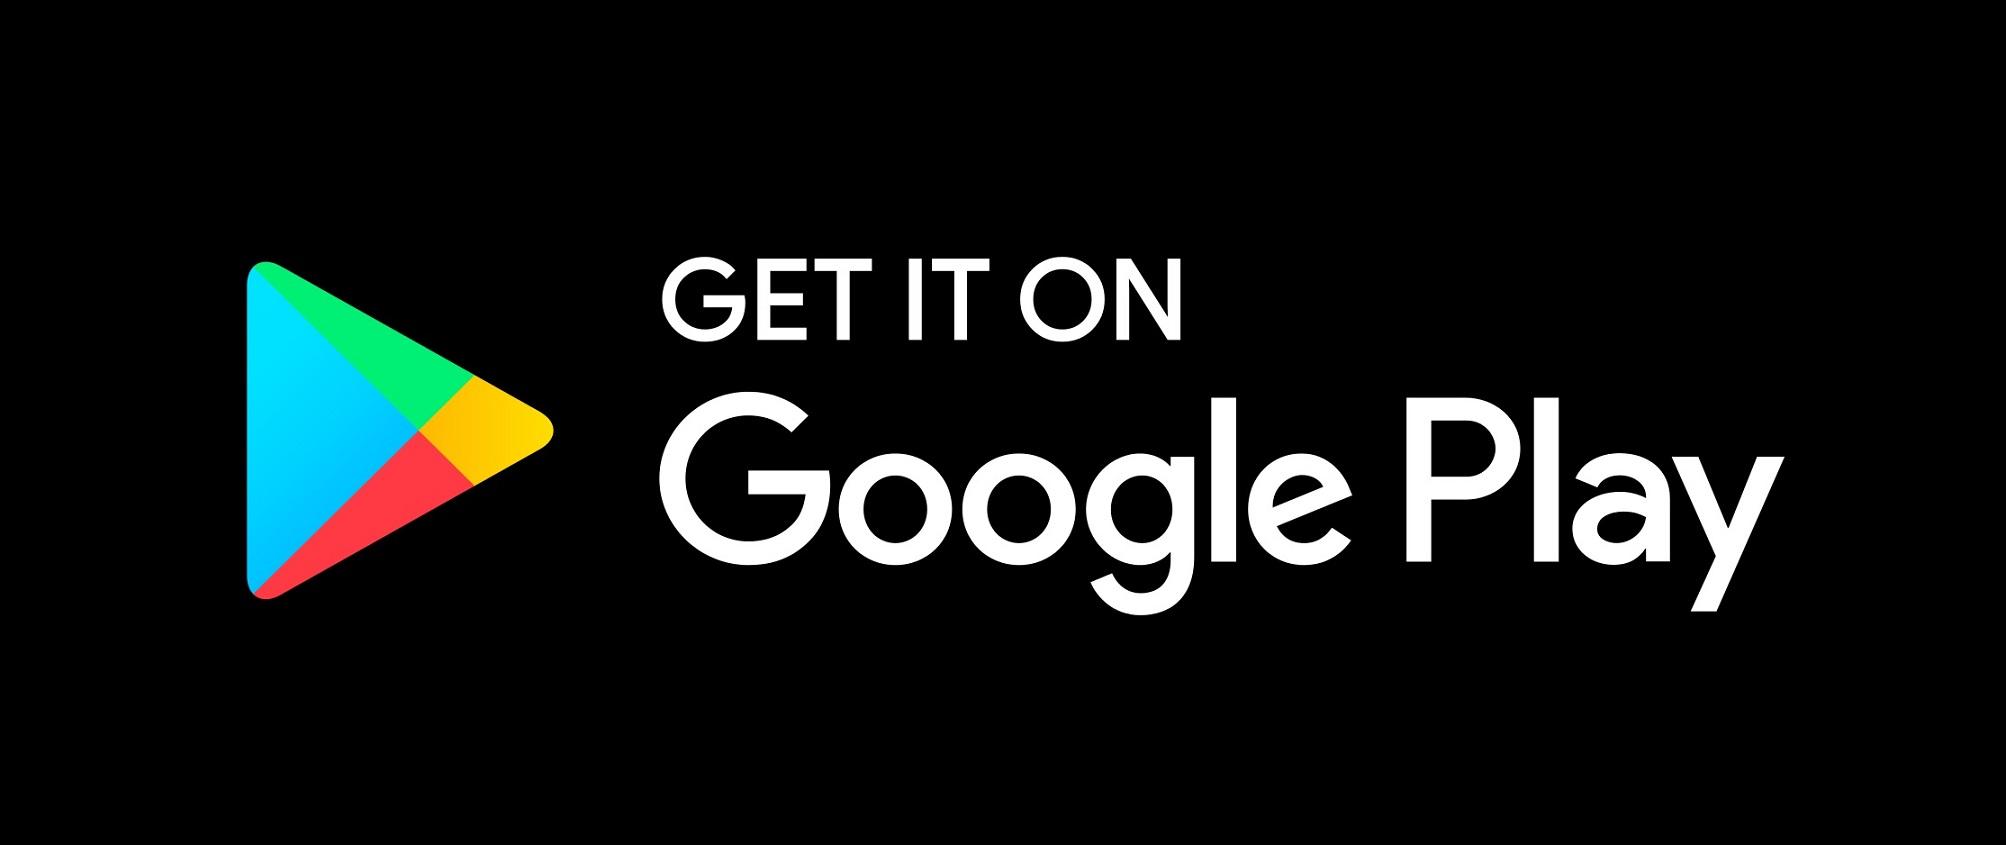 get_it_on_google_play